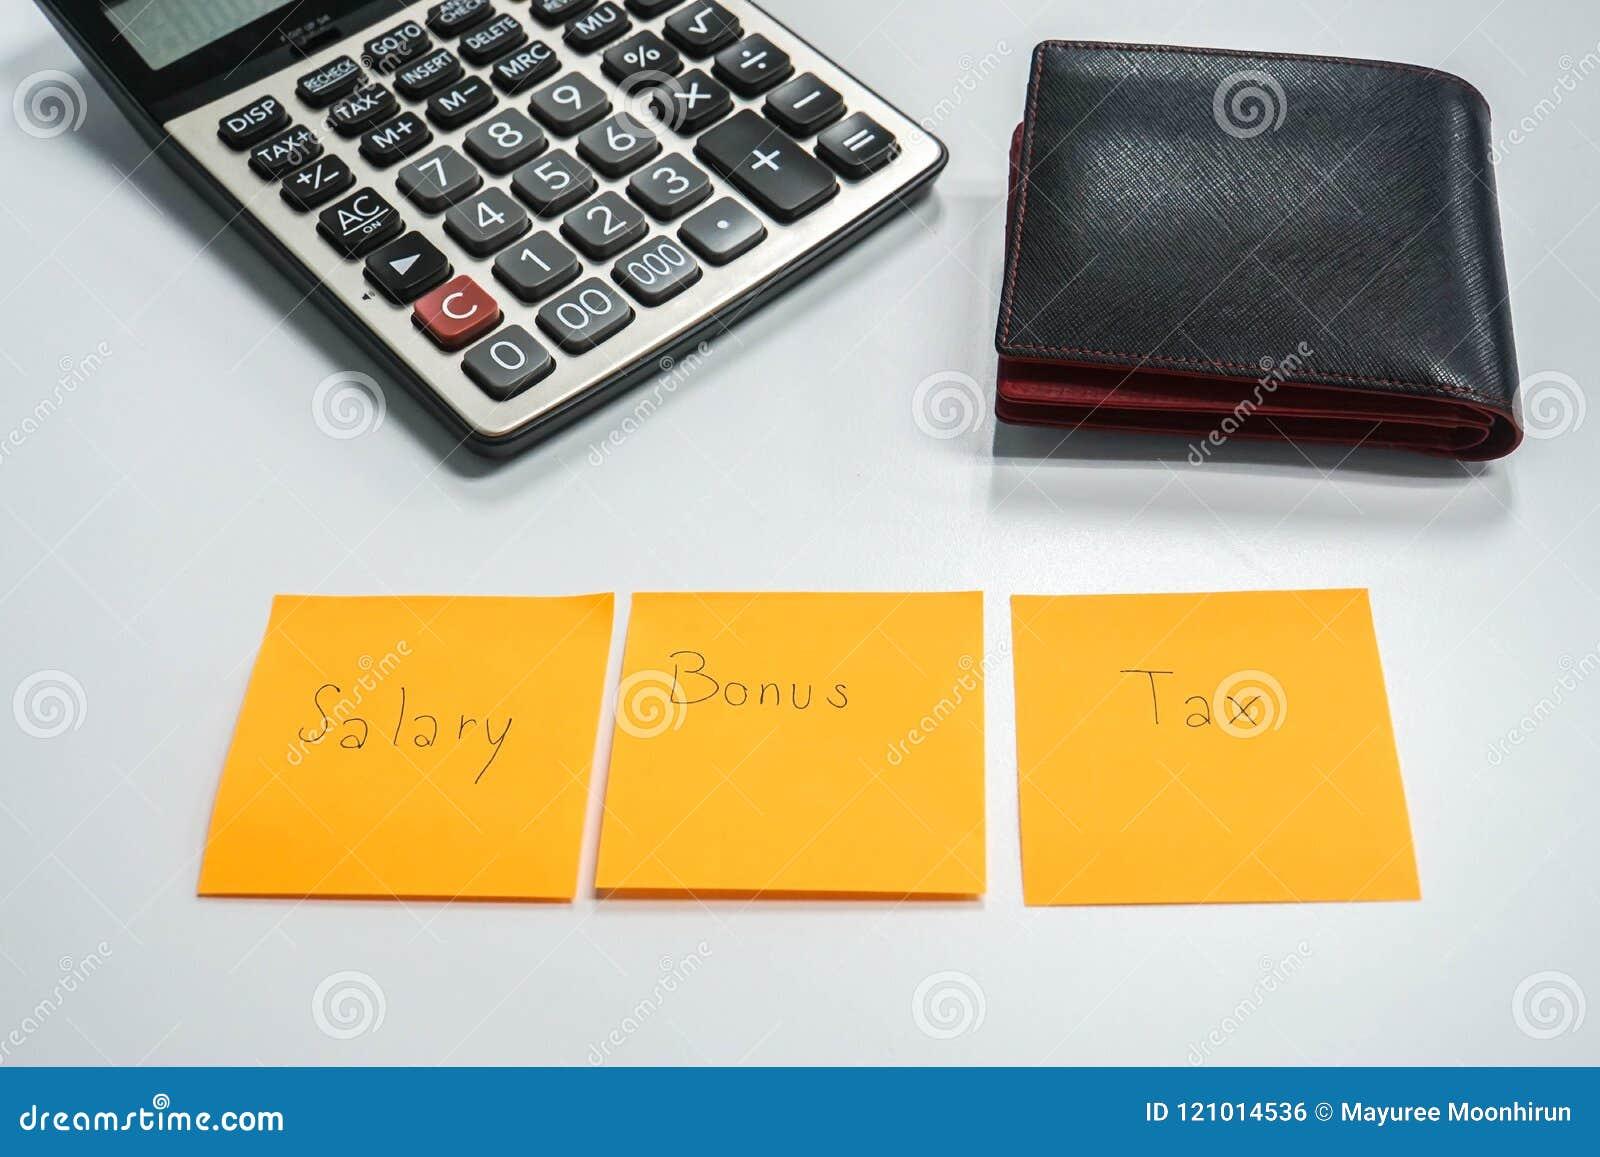 Tax rate on a bonus calculator.